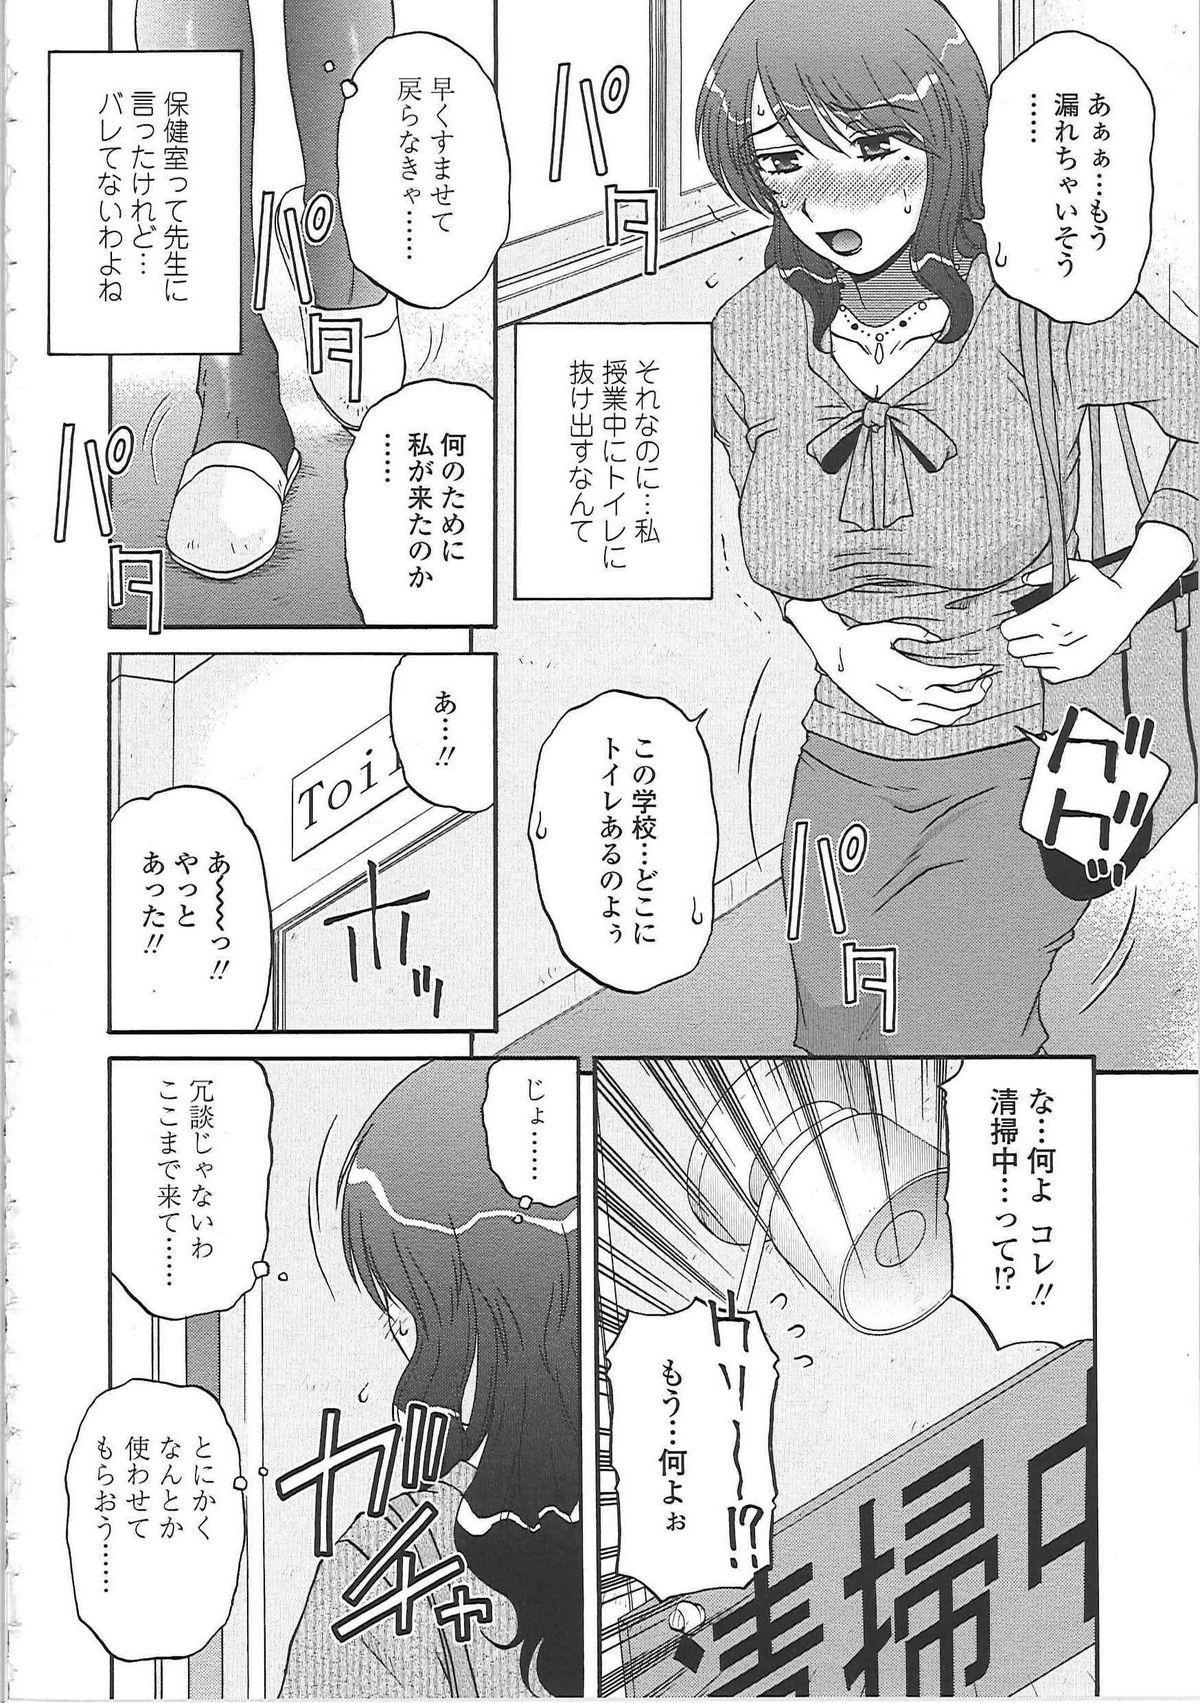 Nikuzuma Tsuushin - Erotic Wife Communication 112